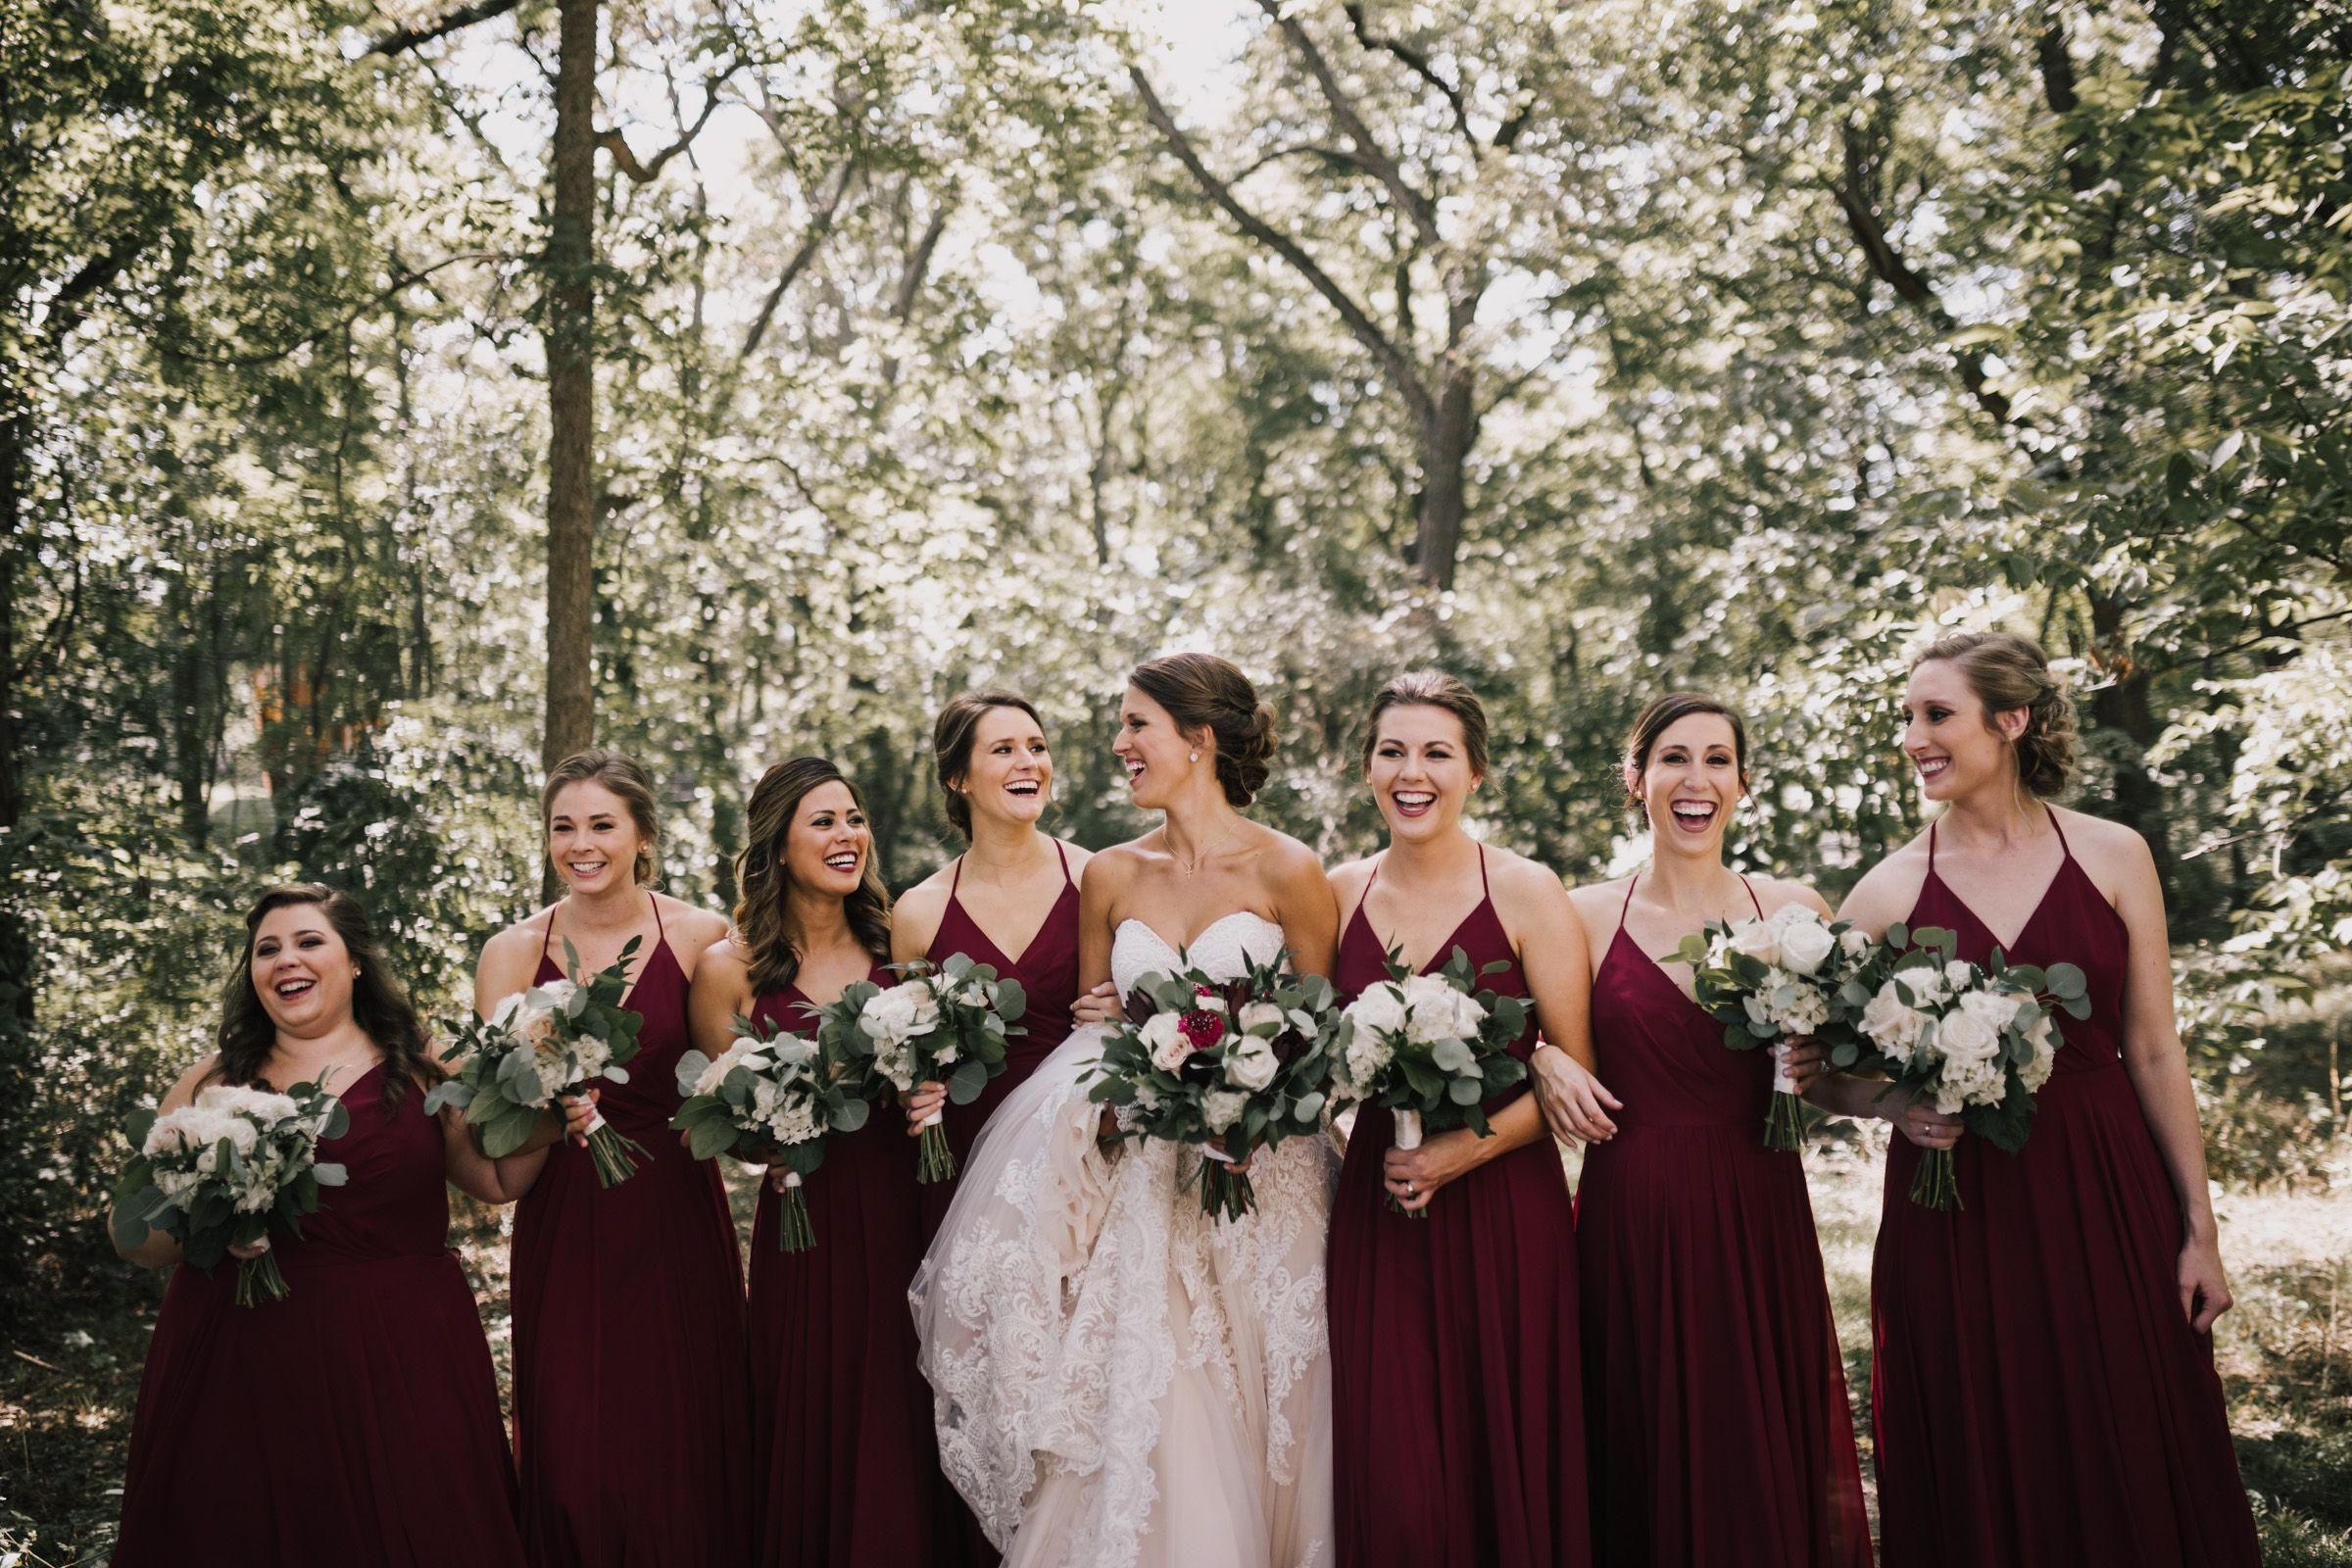 Fun Summer Burgundy Wedding Bridesmaids Style Www Alyssabarletter Com Summer Bridesmaid Dresses Burgandy Bridesmaids Dress Burgandy Wedding [ 1600 x 2400 Pixel ]